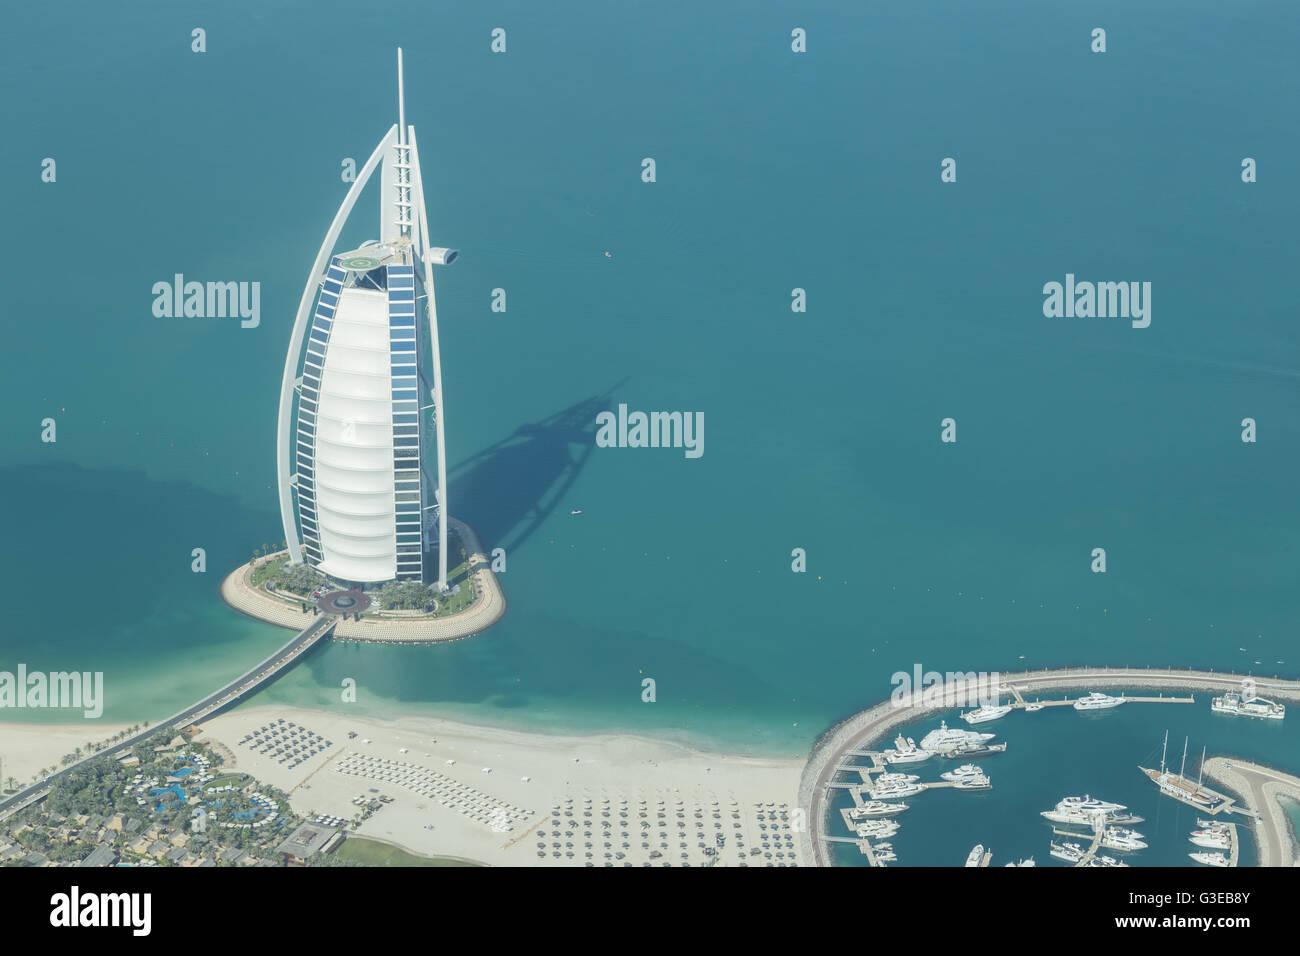 Dubai, United Arab Emirates - October 17, 2014: Photograph of the famous Burj Al Arab hotel in Dubai taken from - Stock Image